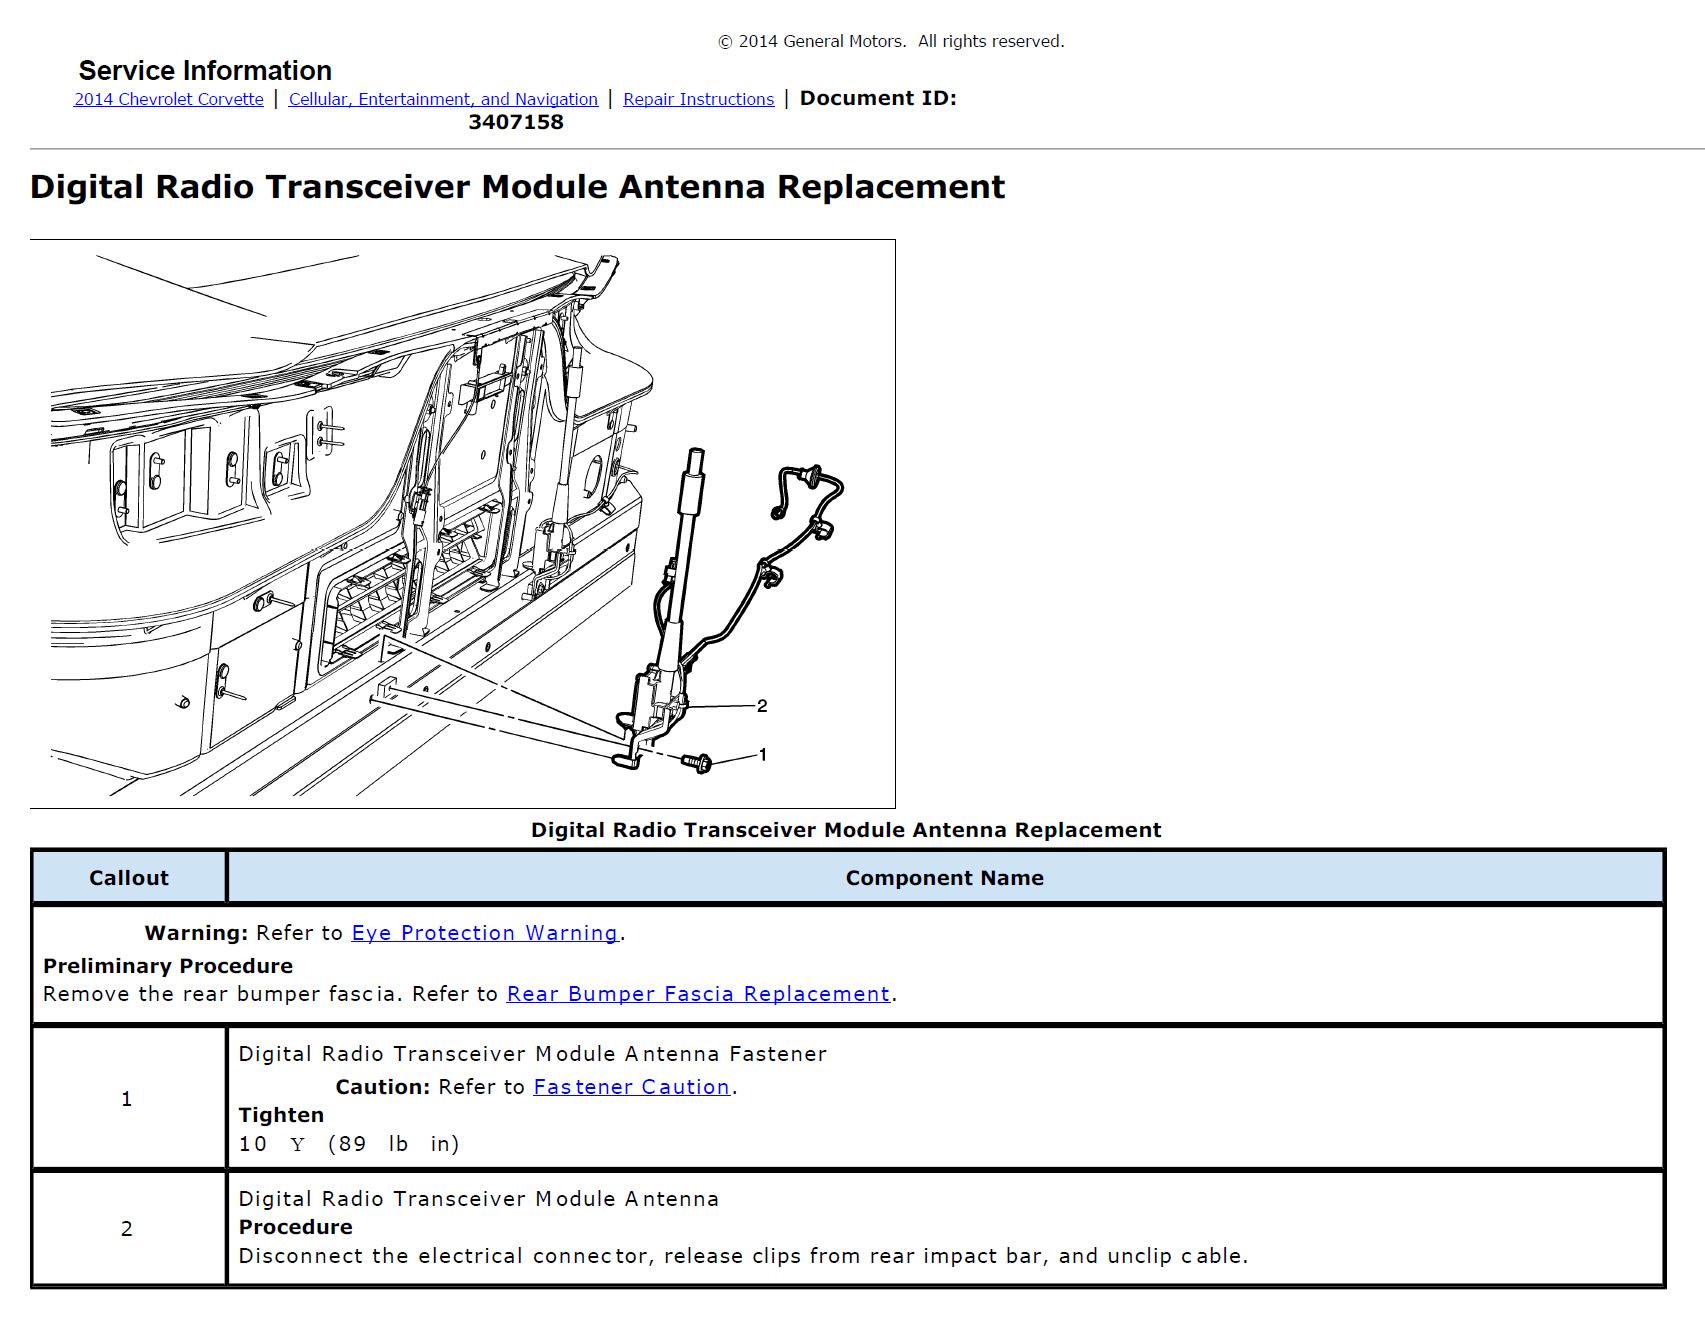 DG_4198] Gm Nav Wiring Diagram Download DiagramWiluq Ally Drosi Benol Basi Semec Mohammedshrine Librar Wiring 101